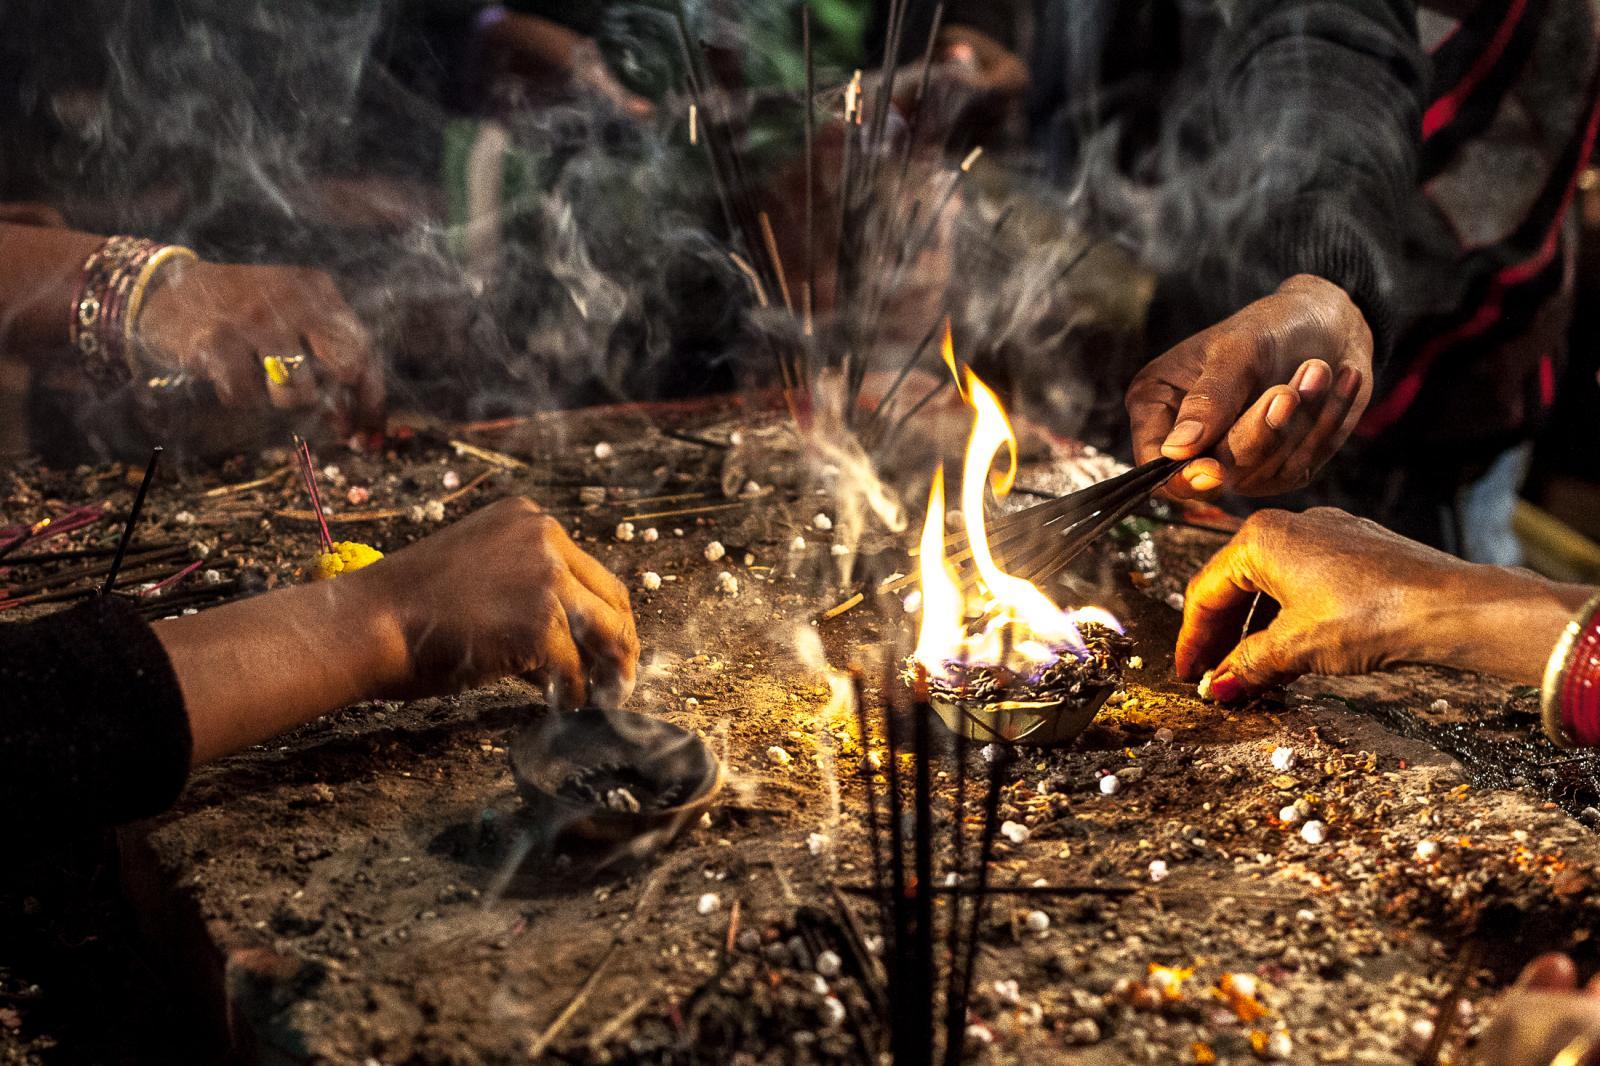 Photography image - Loading 005_Gadhimai-Nepal-Omar-Havana.jpg